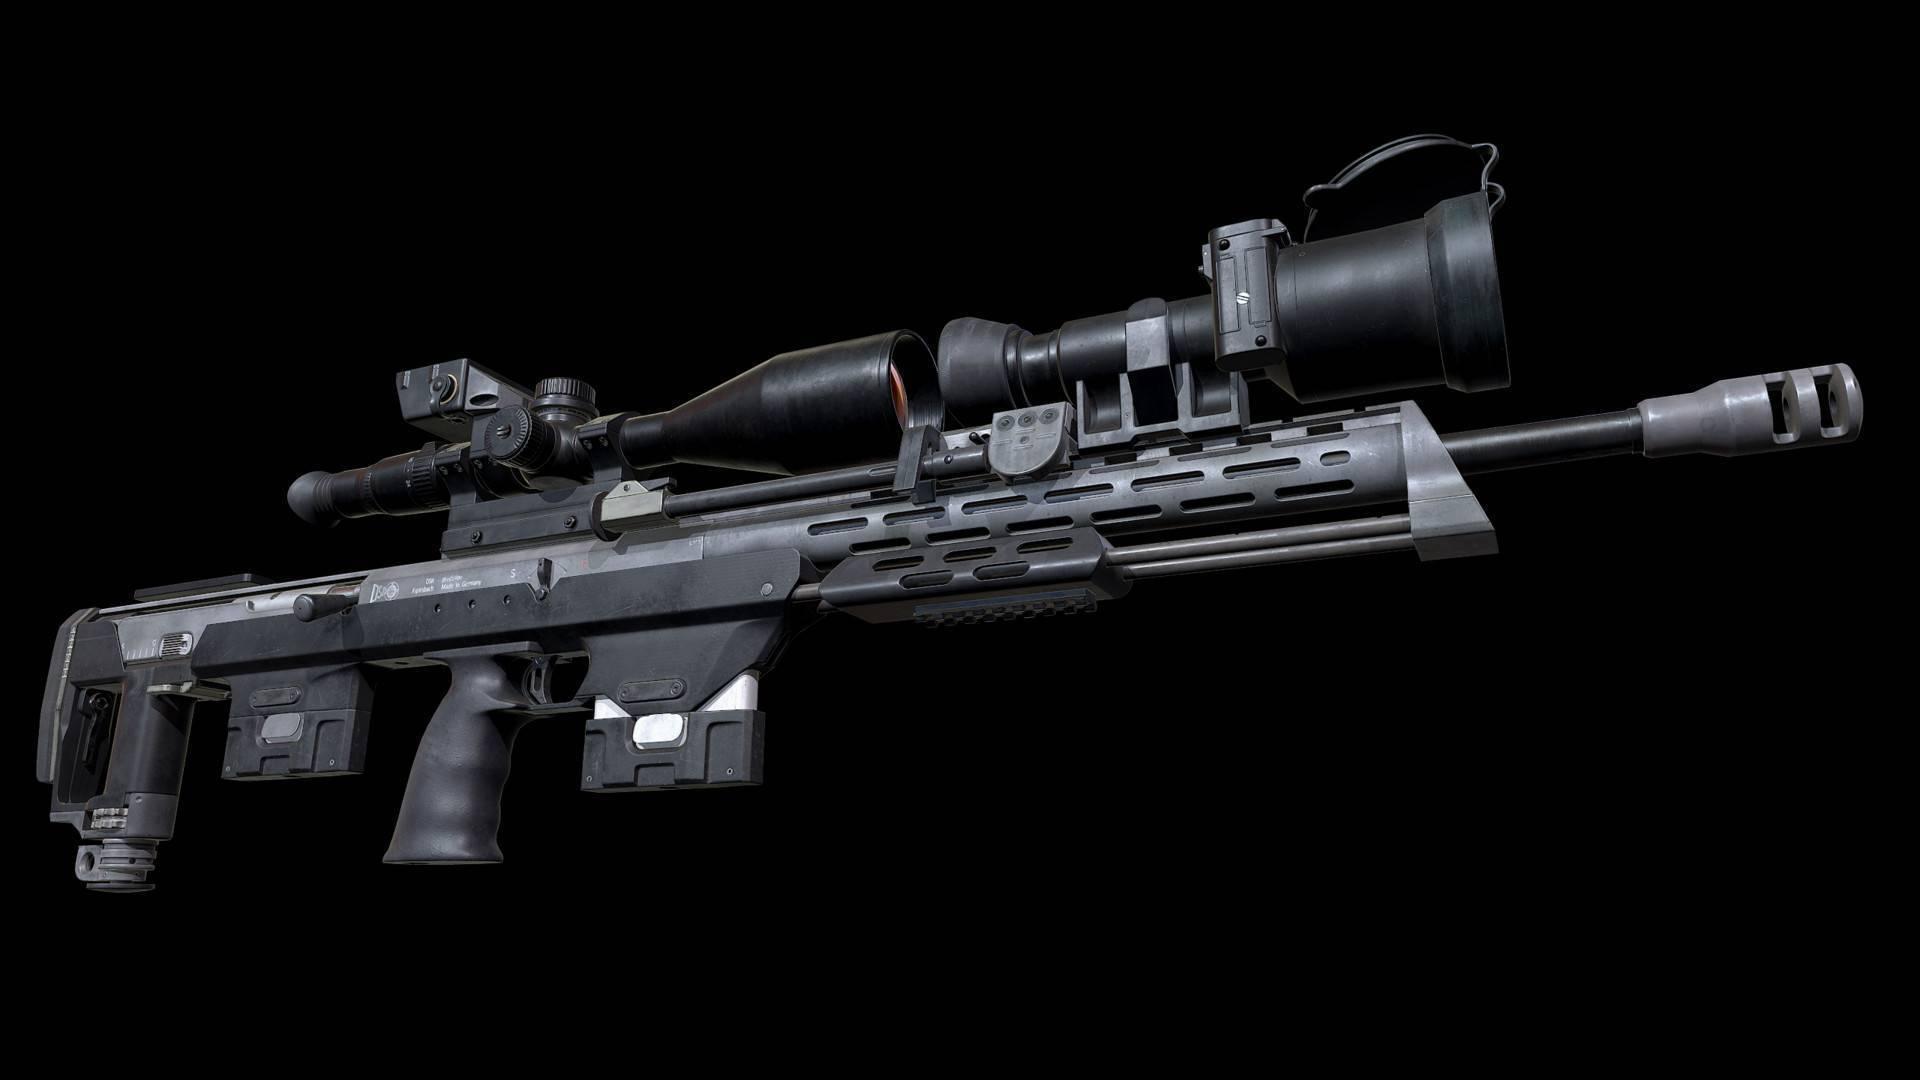 Снайперская винтовка dsr 1 / dsr 1 subsonic / dsr 1 tactical / dsr 50